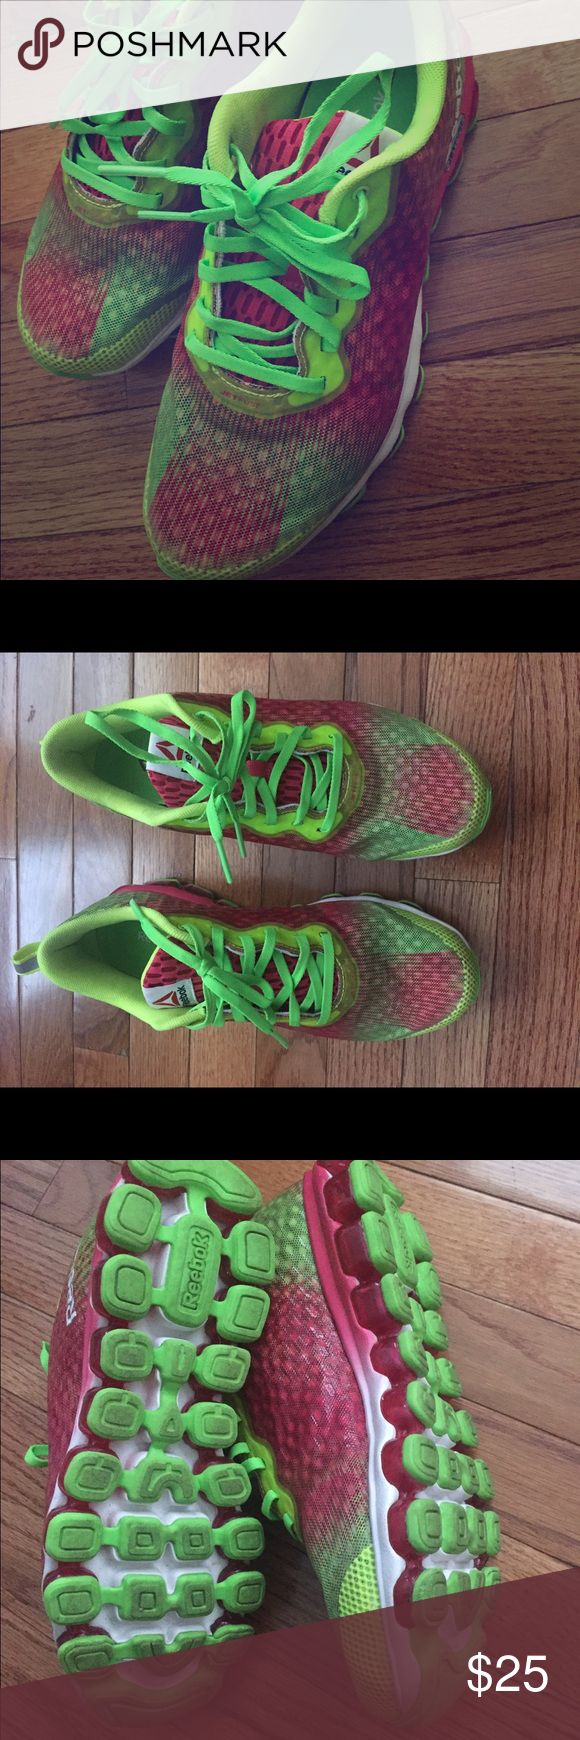 Reebok Women Z Jet Thunder Running sneakers Reebok Women Z Jet Thunder Running Shoes - Yellow / Pink / Green / White Reebok Shoes Sneakers